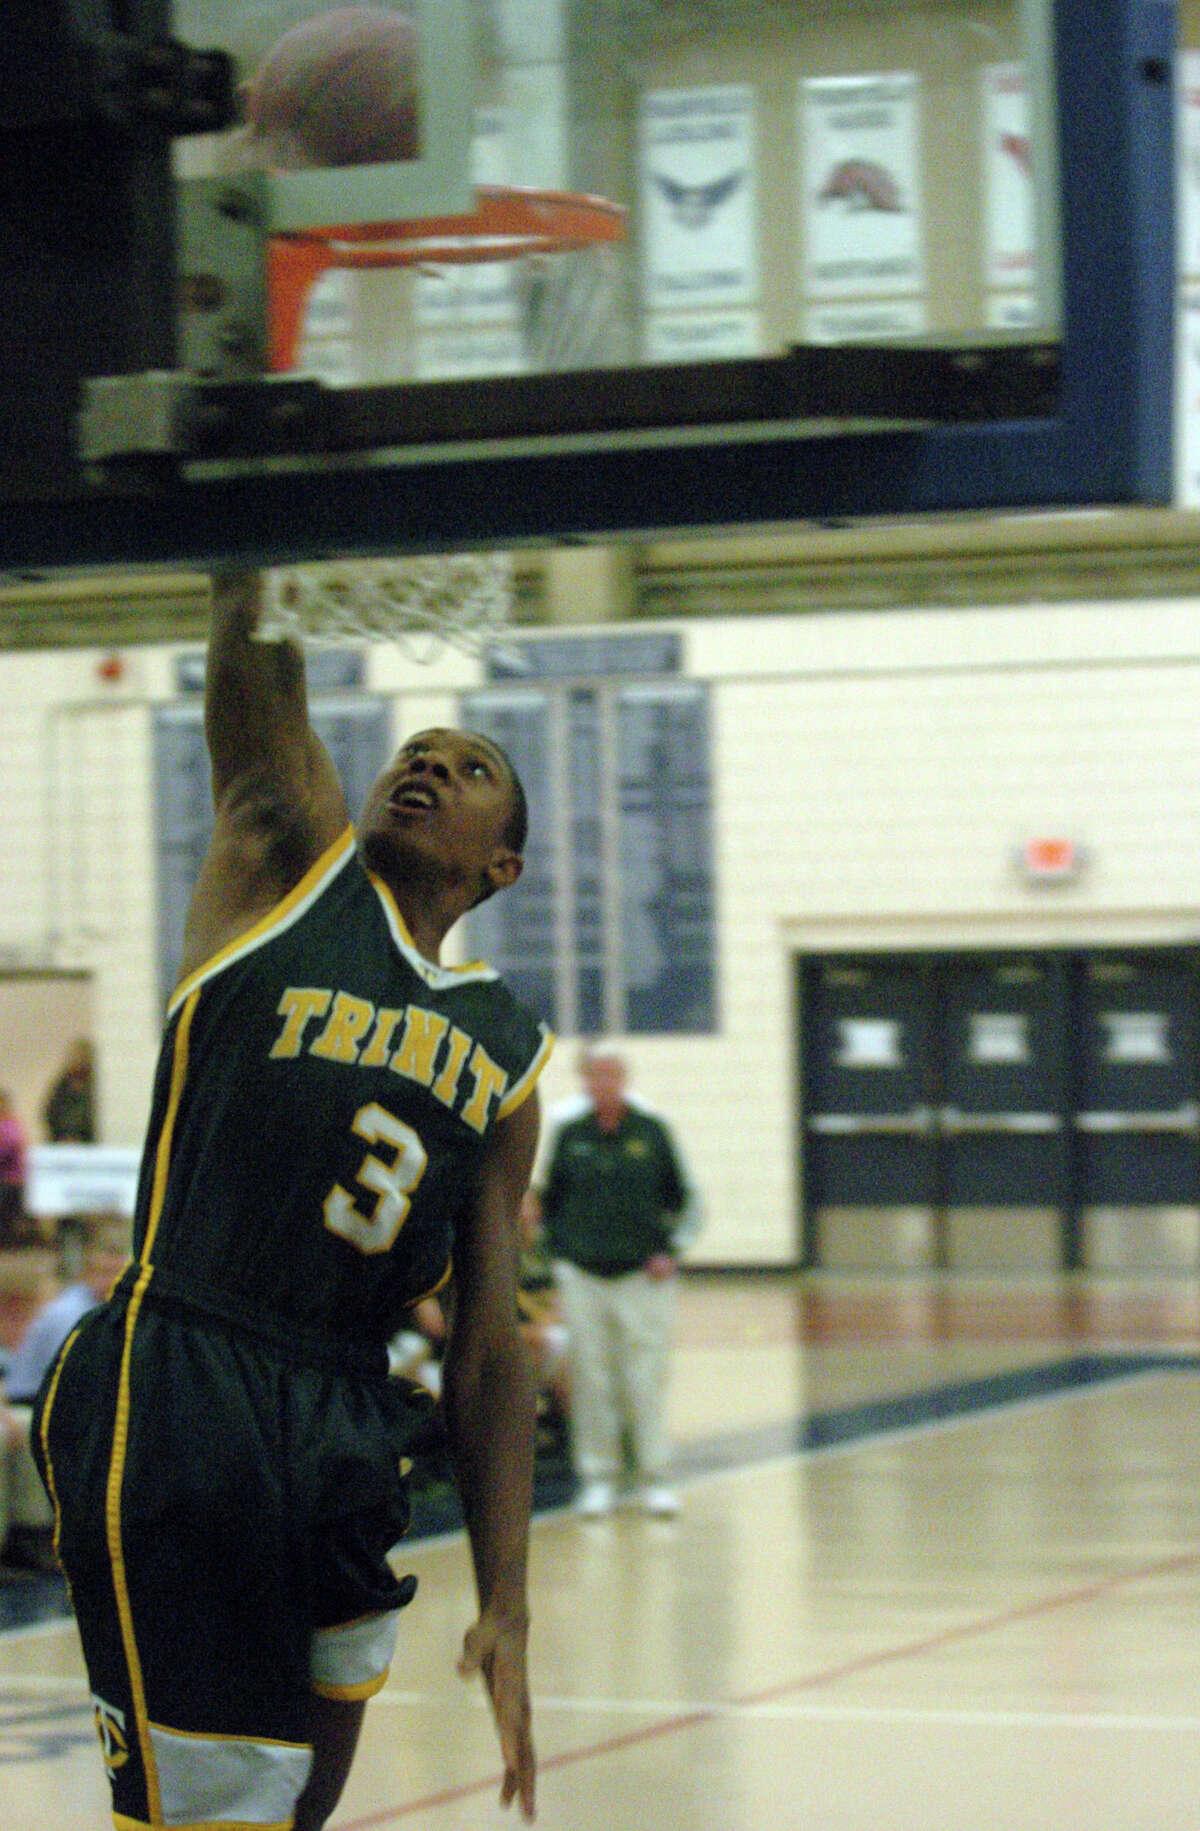 Trinity's Tremaine Frasier shoots as Wilton High School hosts Trinity Catholic in a boys basketball game in Wilton, Conn., Feb. 12, 2013.